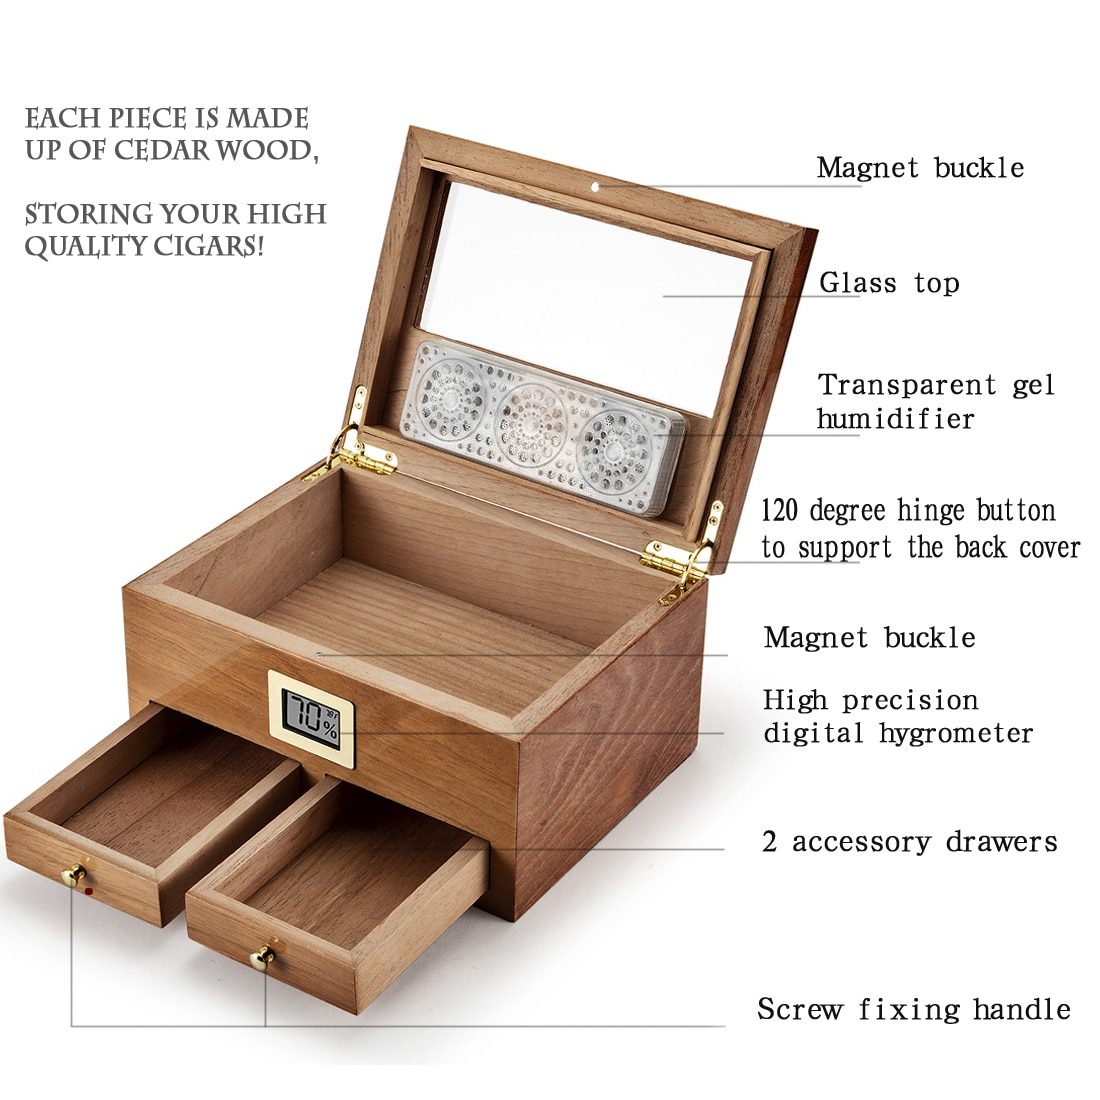 Cedar Wood Cigar Humidor W/Hygrometer Humidifier 2 Drawers Travel Cigarette Storage Box Portable Cabinet Smoking Case For Cohiba enlarge